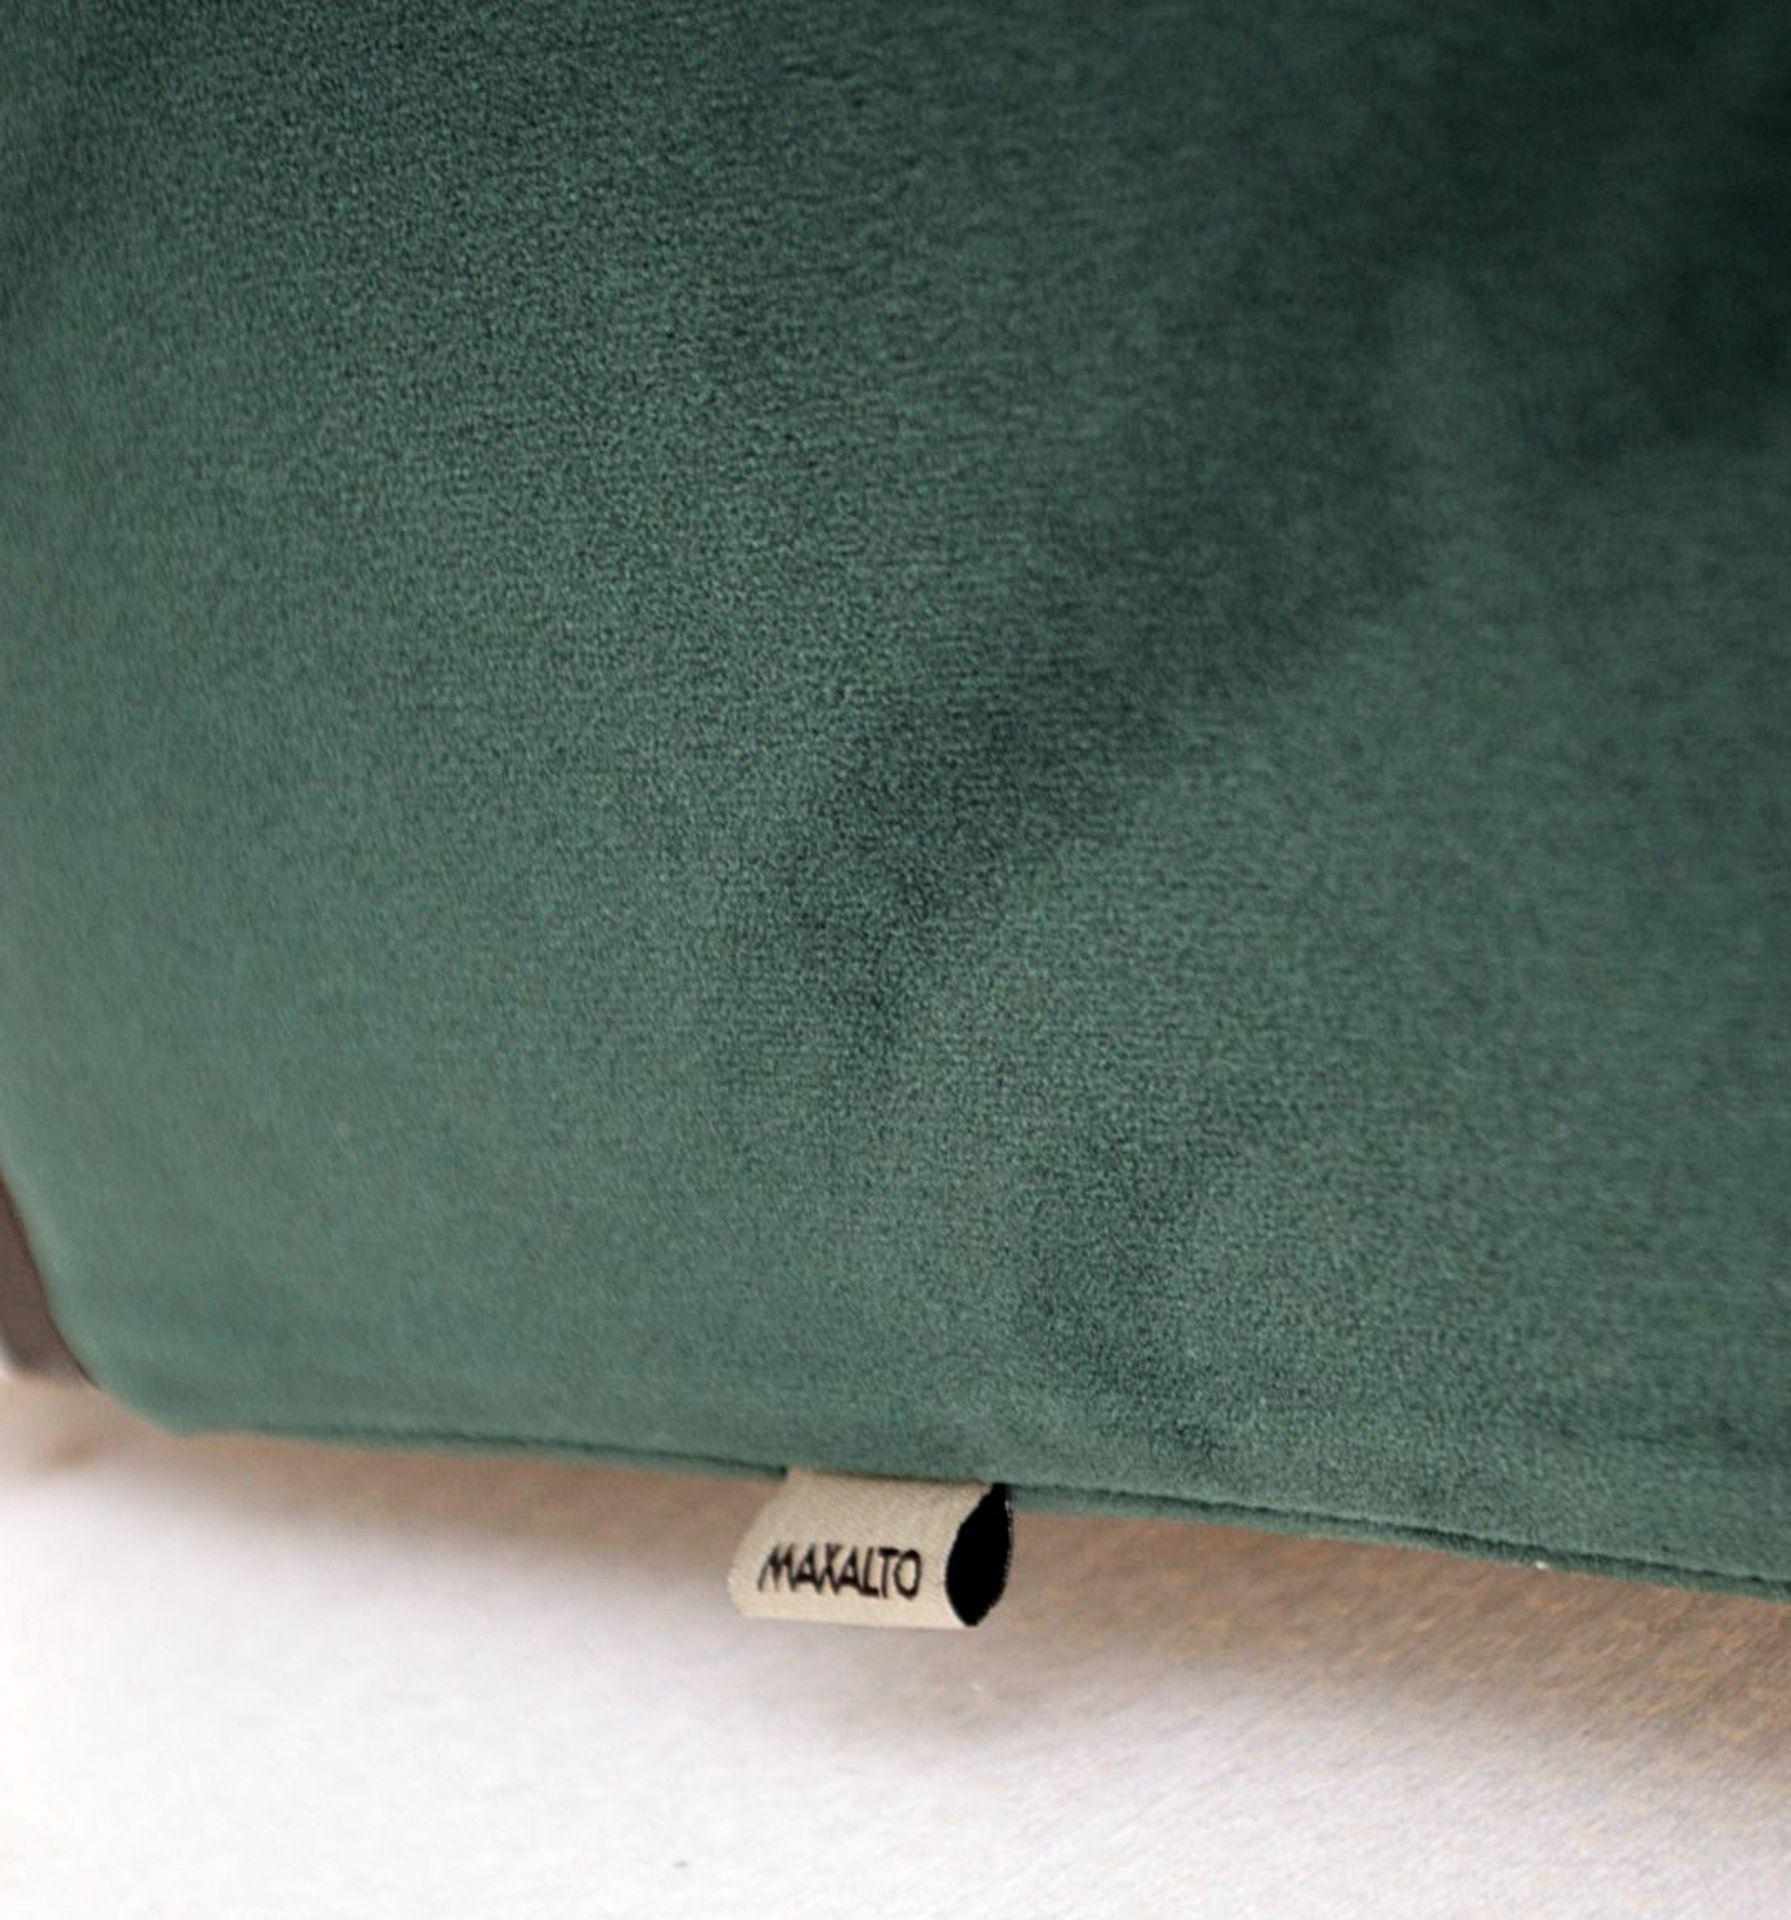 2 x B&B Italia MAXALTO Luxury Sofa Sections Both Upholstered In Rich Dark Green Velvet - RRP £7,248 - Image 3 of 13